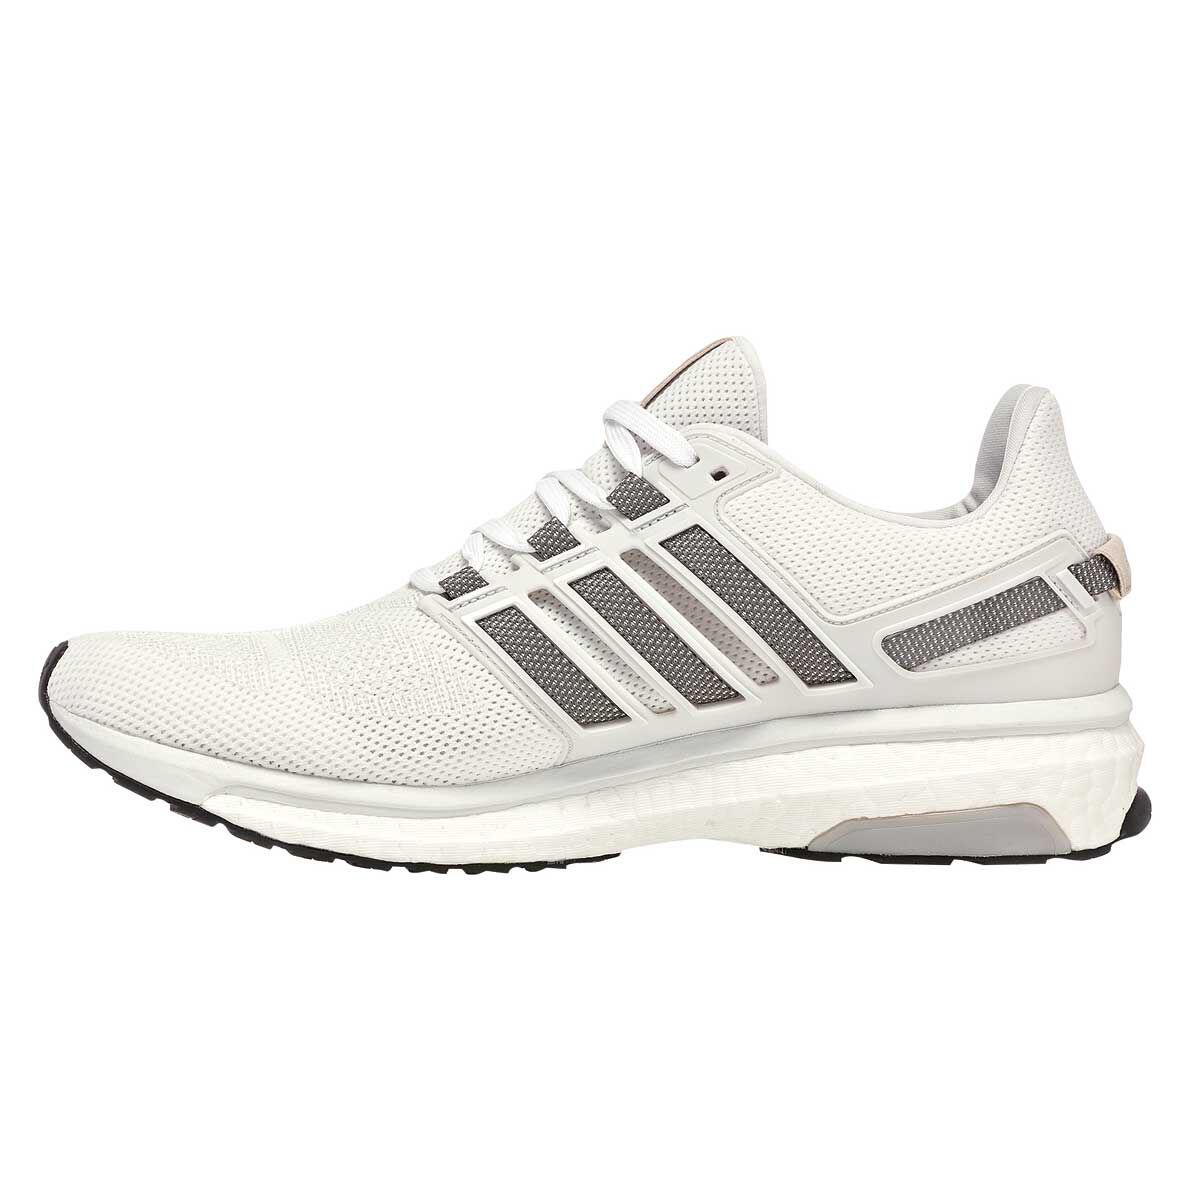 d52da262a88 48fdc ff07f  australia adidas energy boost 3 womens running shoes white grey  us 9 white grey 7abd8 a25f6